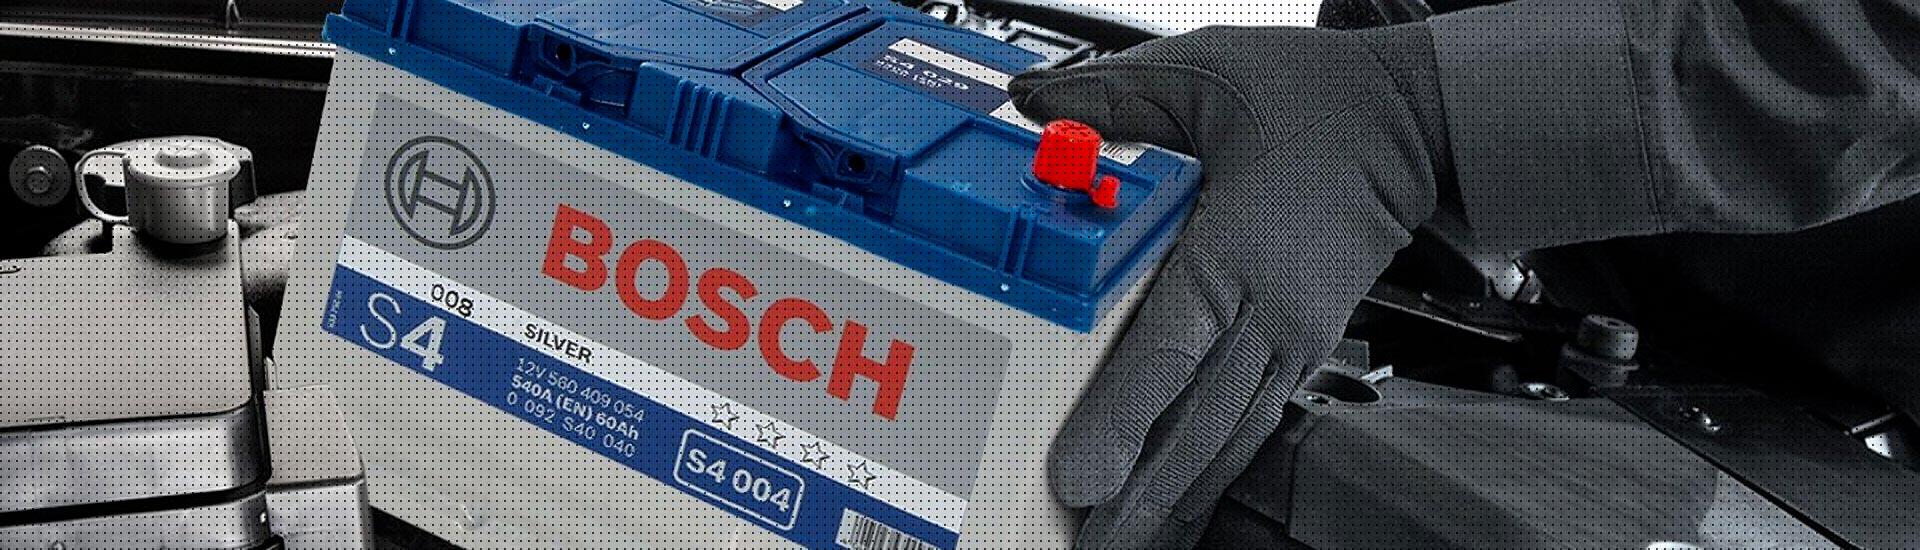 www.auto-baterie-zilina.sk